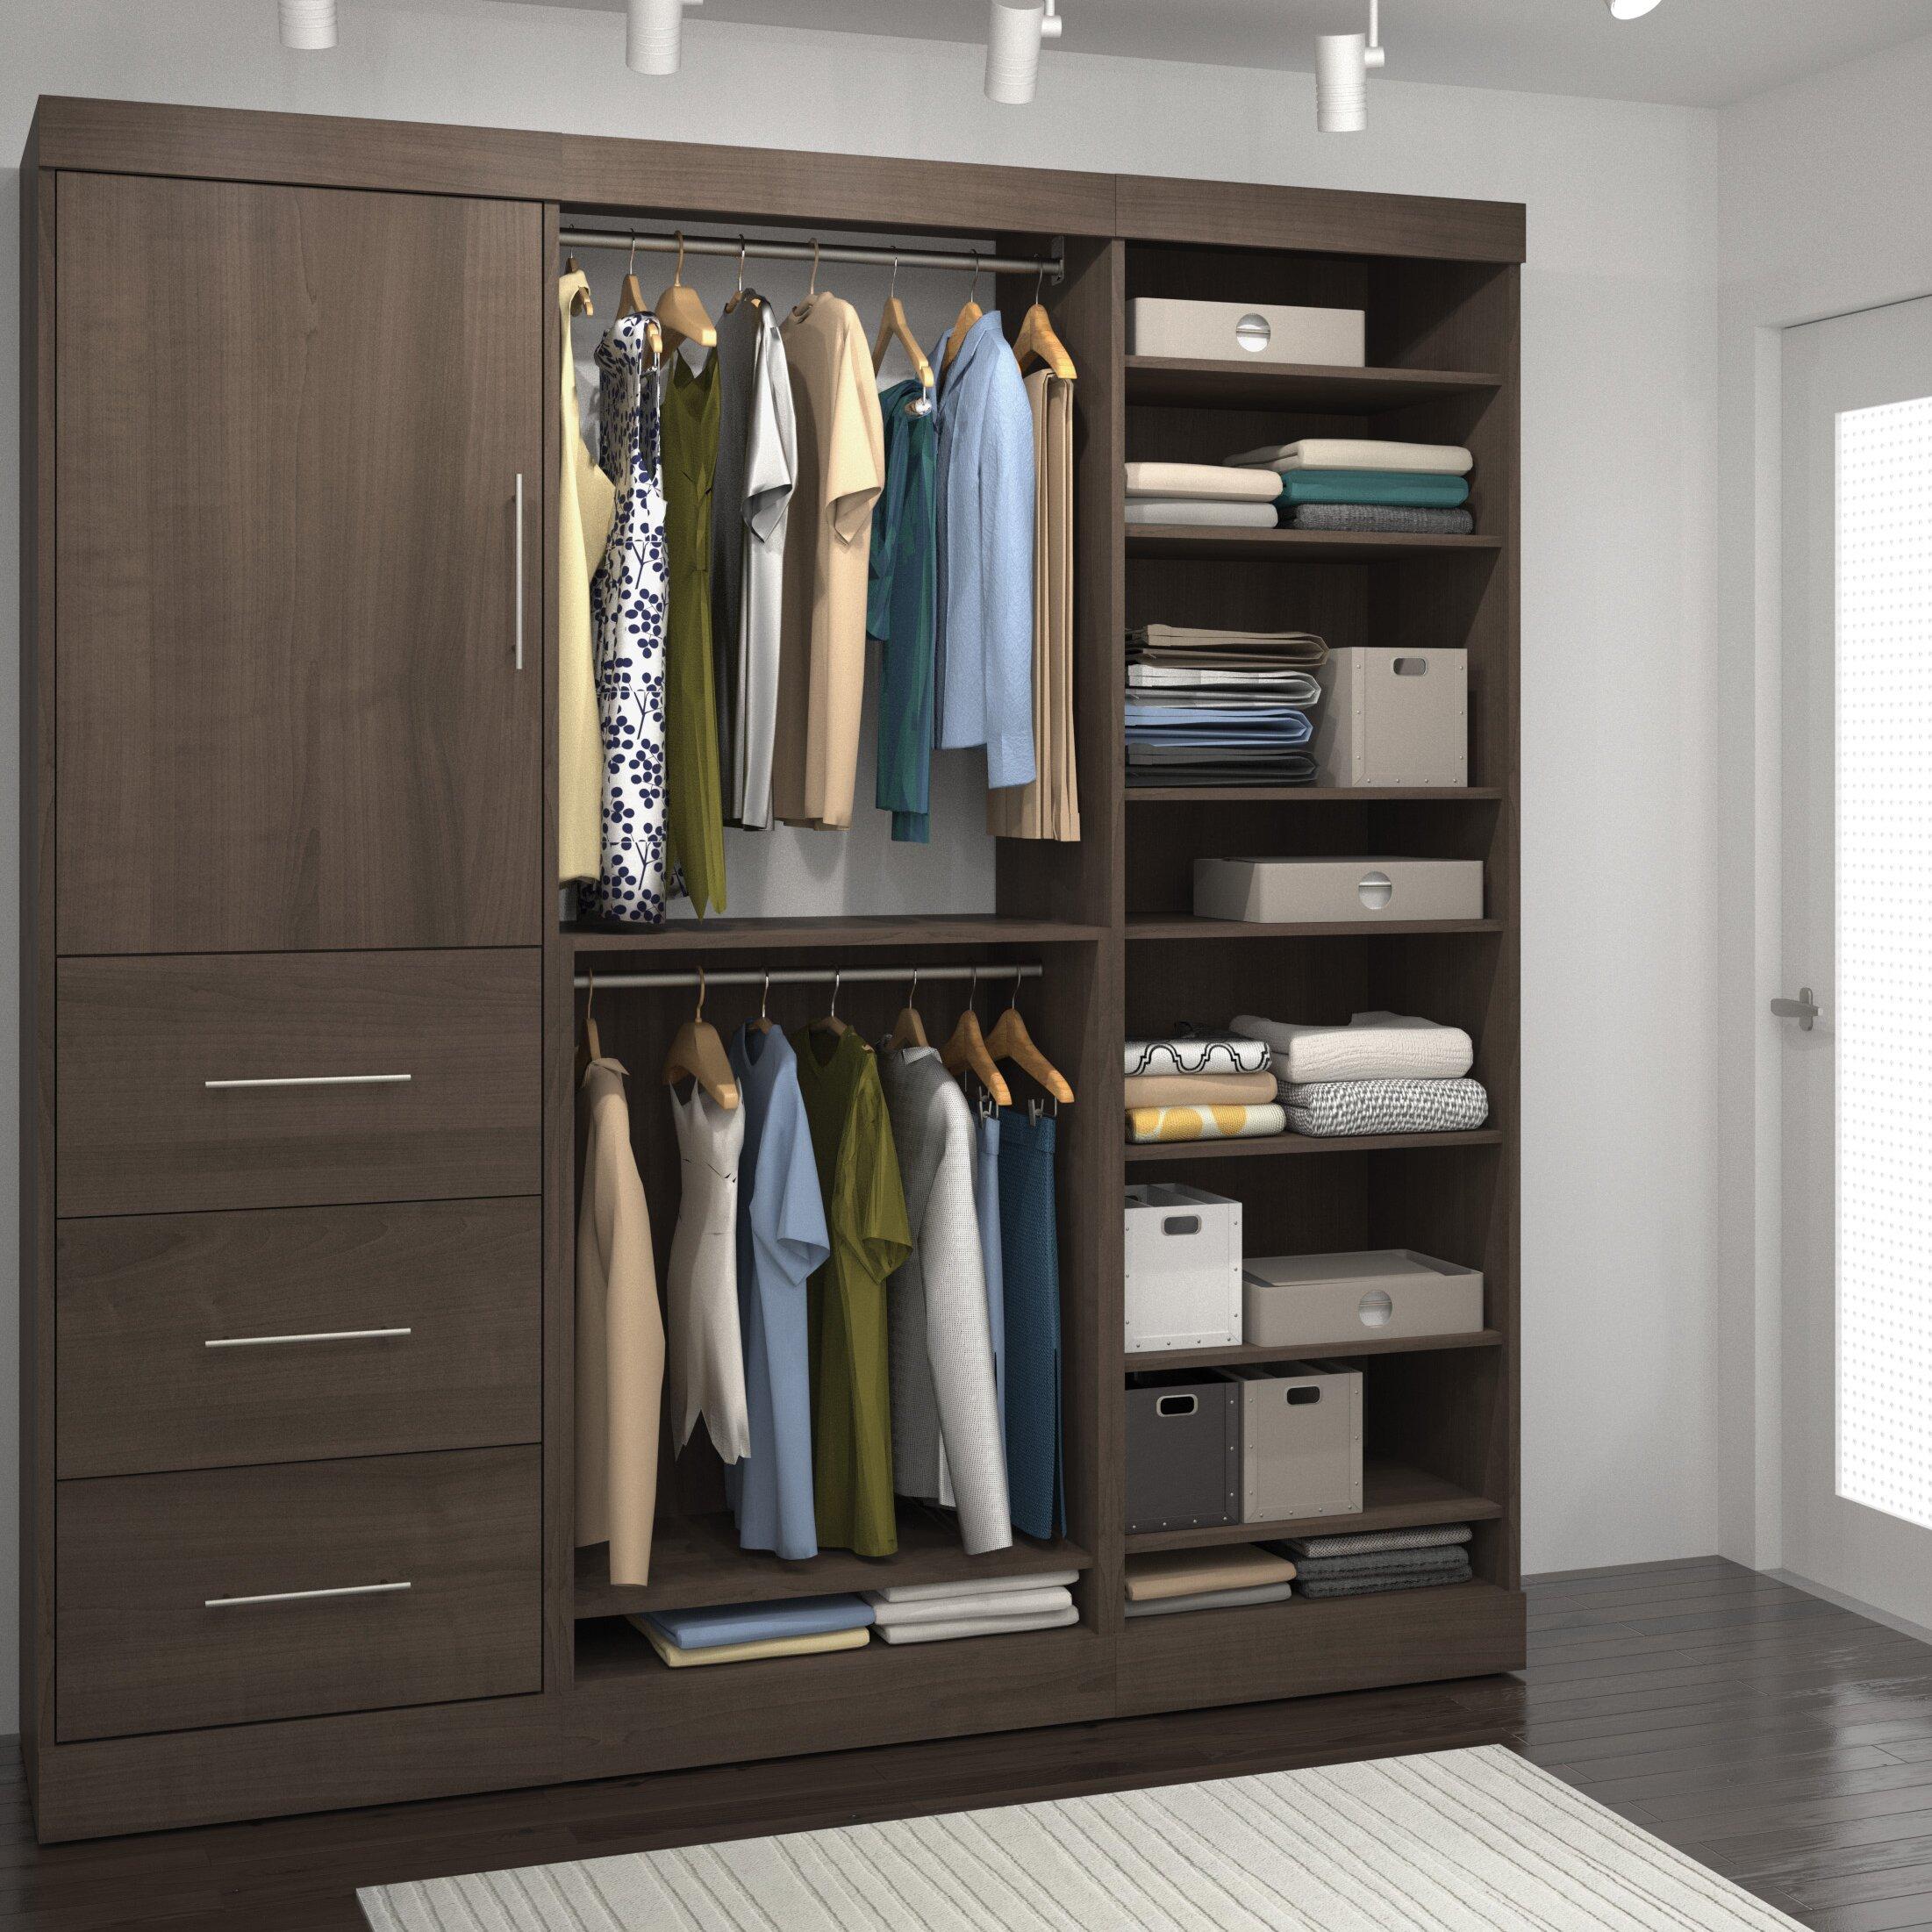 brayden studio truett 80 wide closet system reviews wayfair. Black Bedroom Furniture Sets. Home Design Ideas